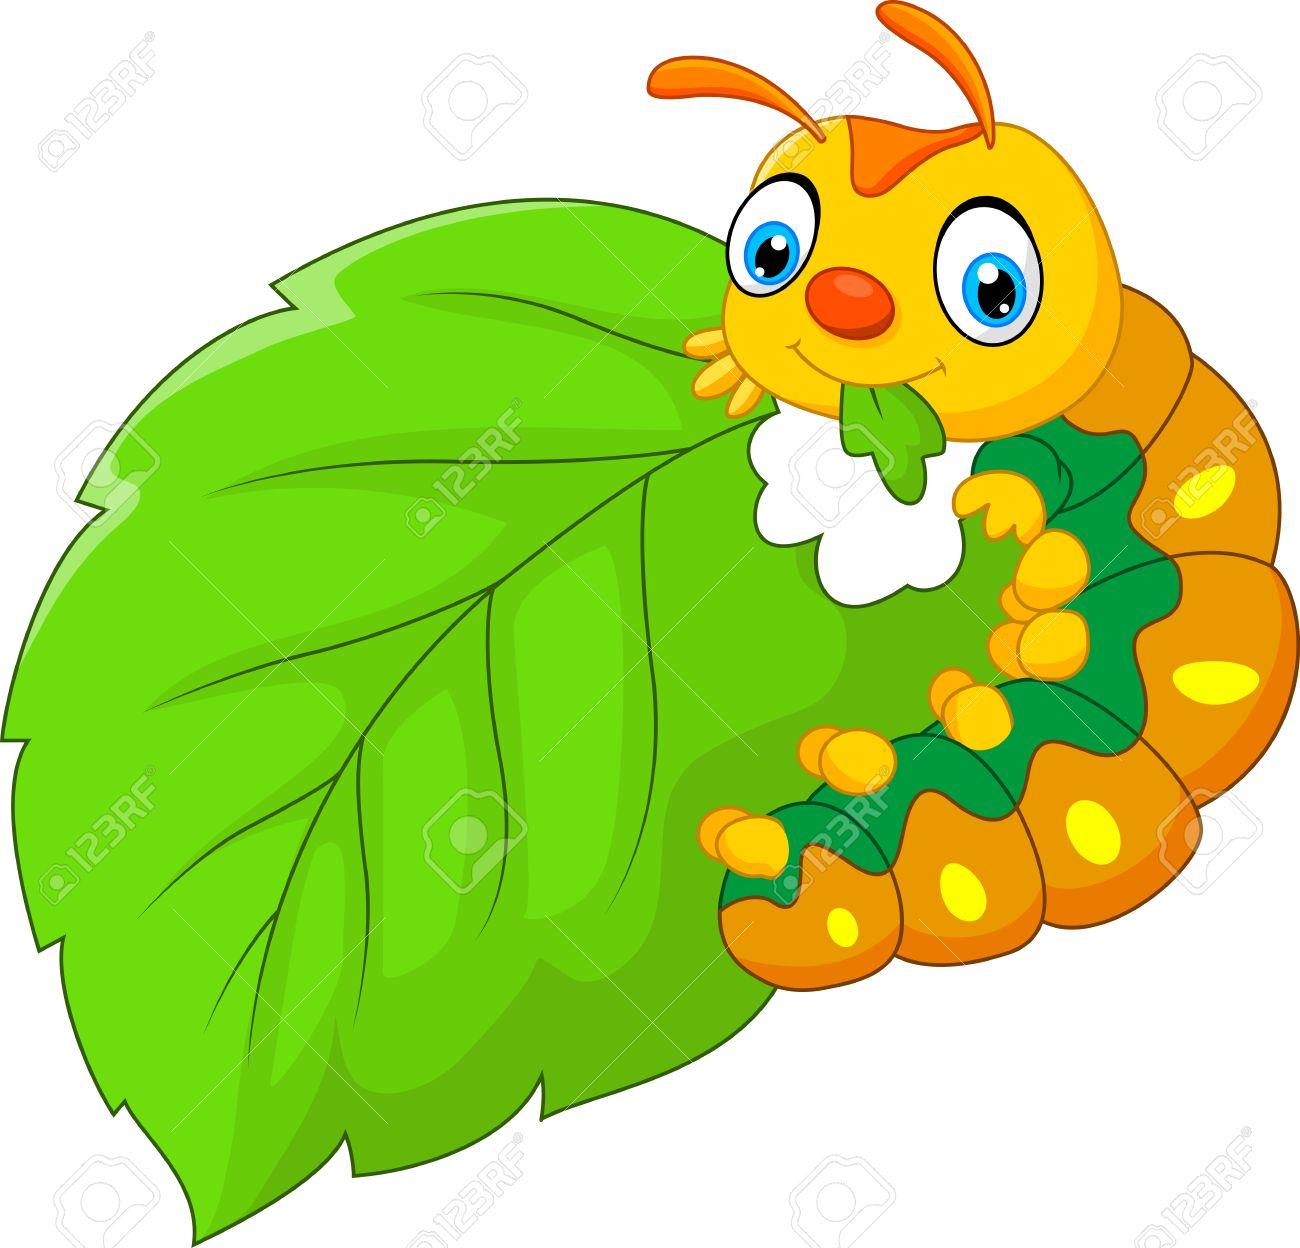 Cartoon Caterpillar Eating Leaf Royalty Free Cliparts Vectors